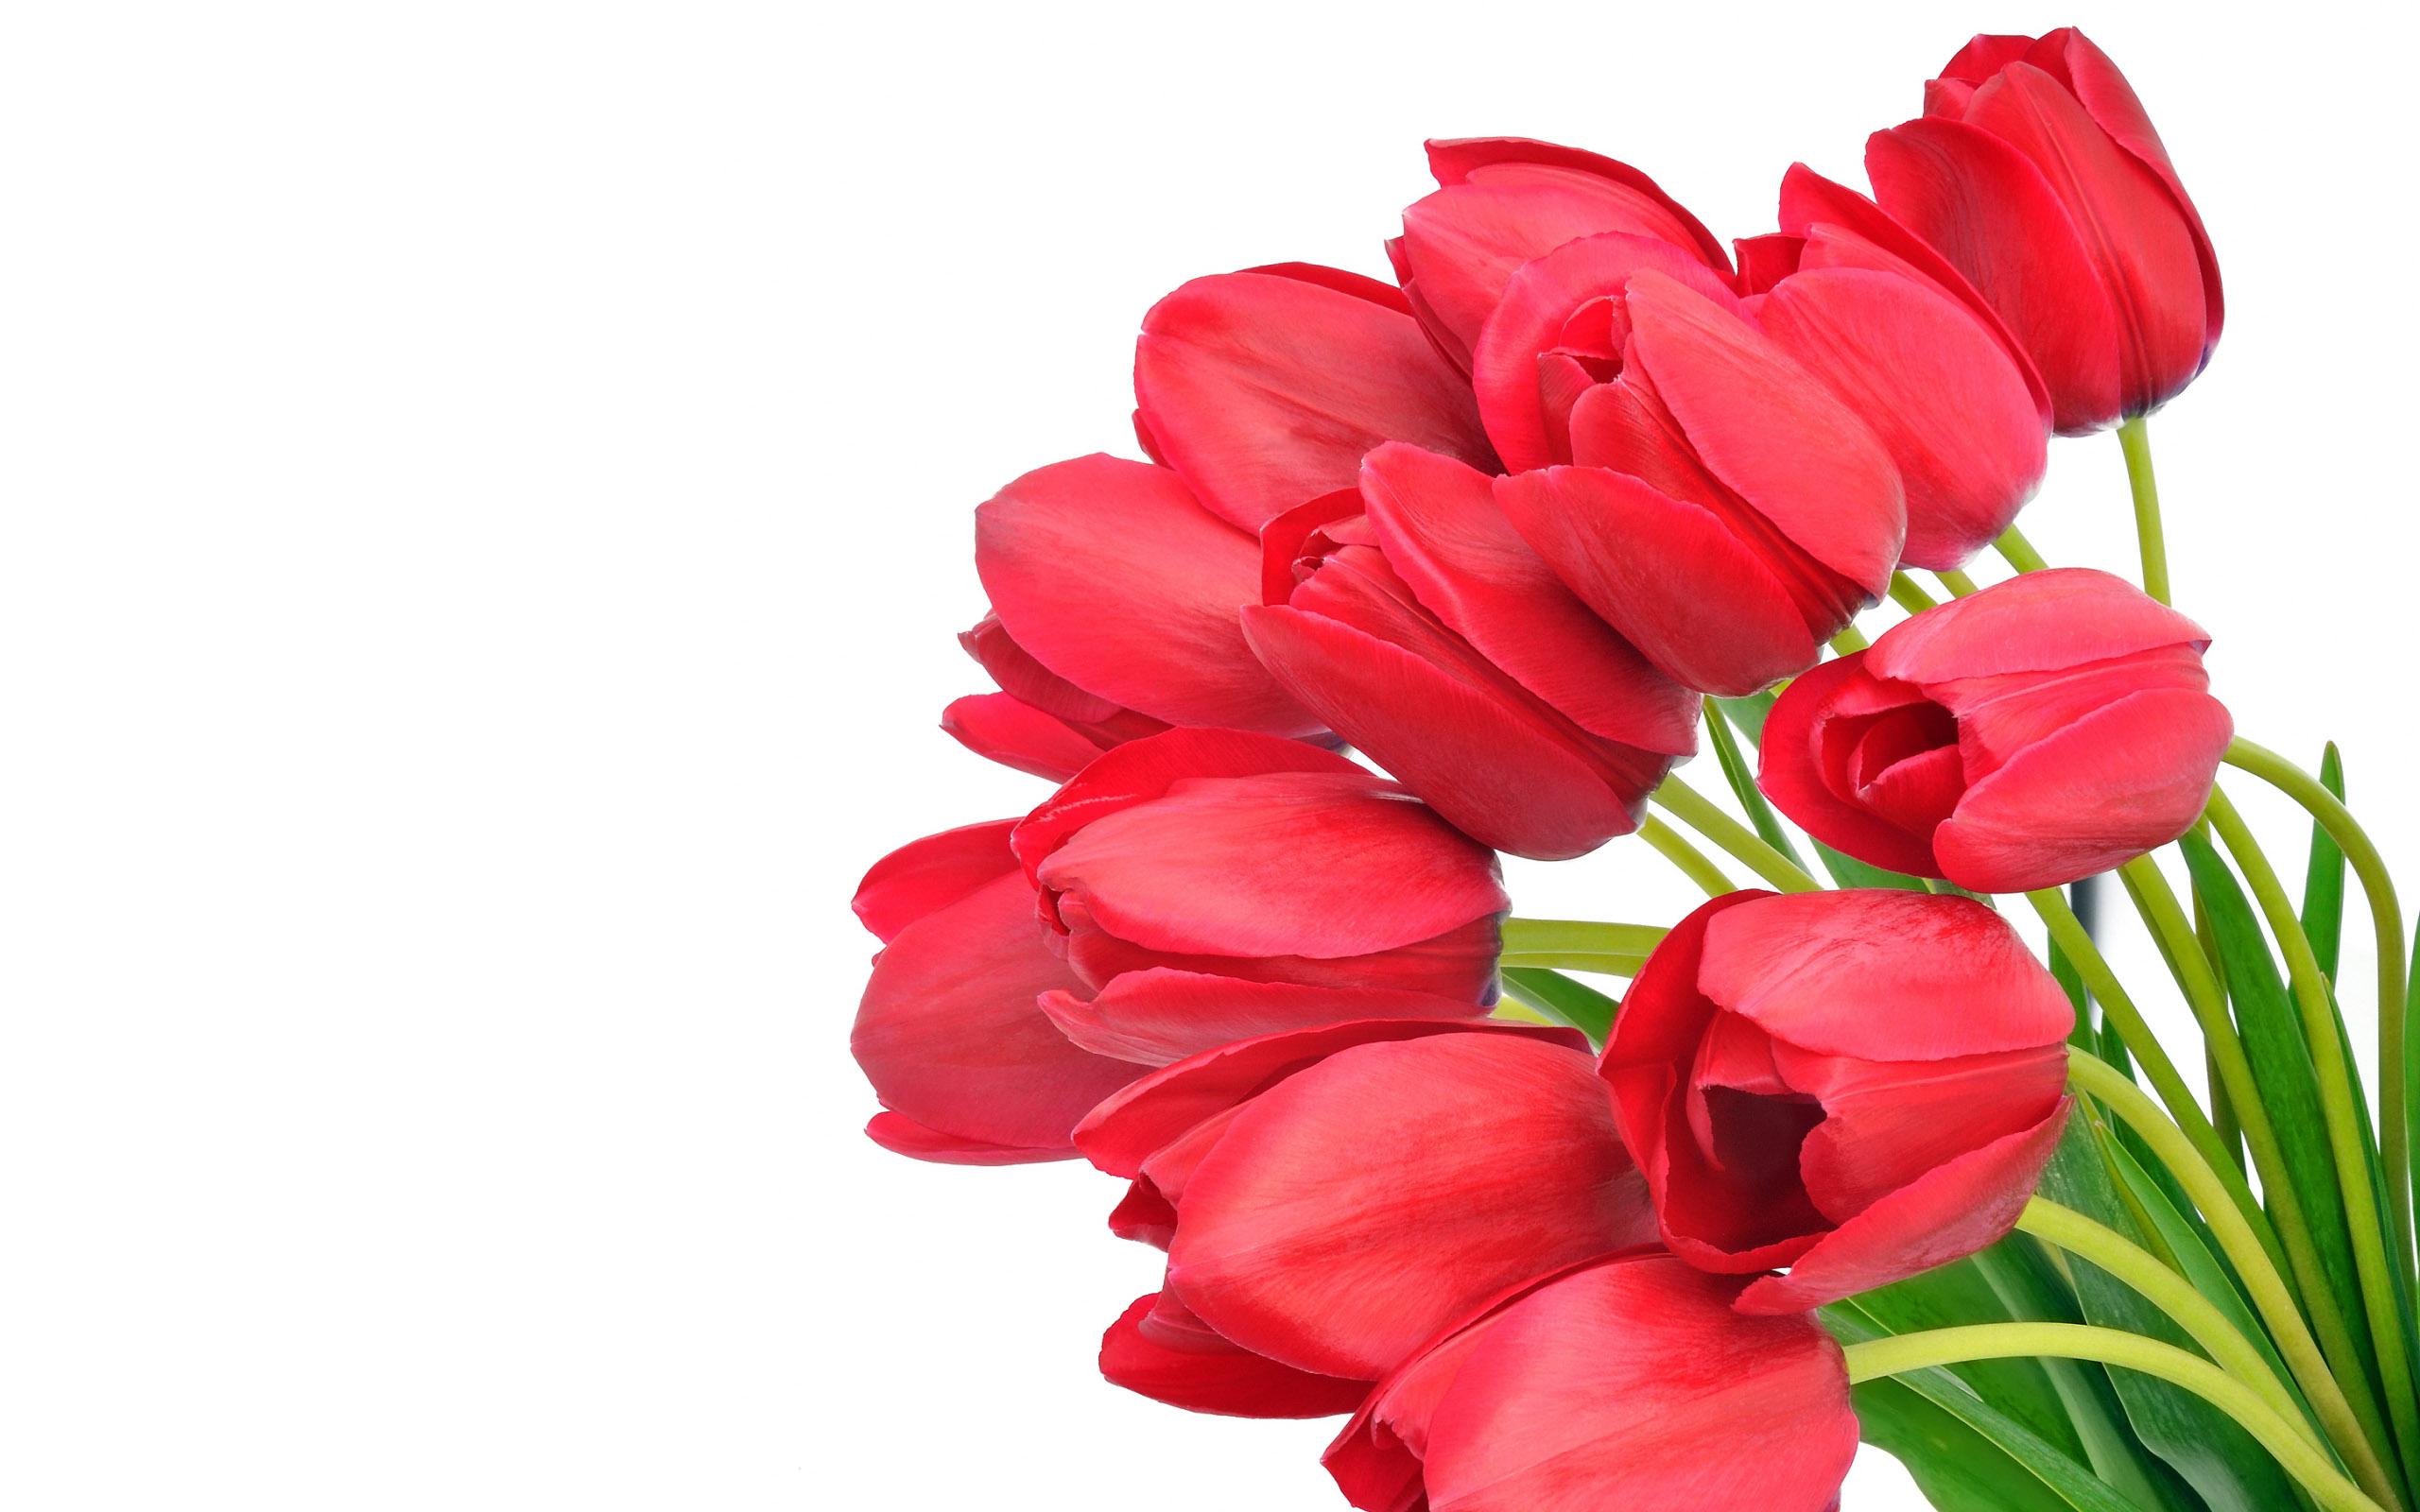 <b>Tulip Bouquet Flowers</b> Wallpaper <b>HD</b> For Desktop and Mobile